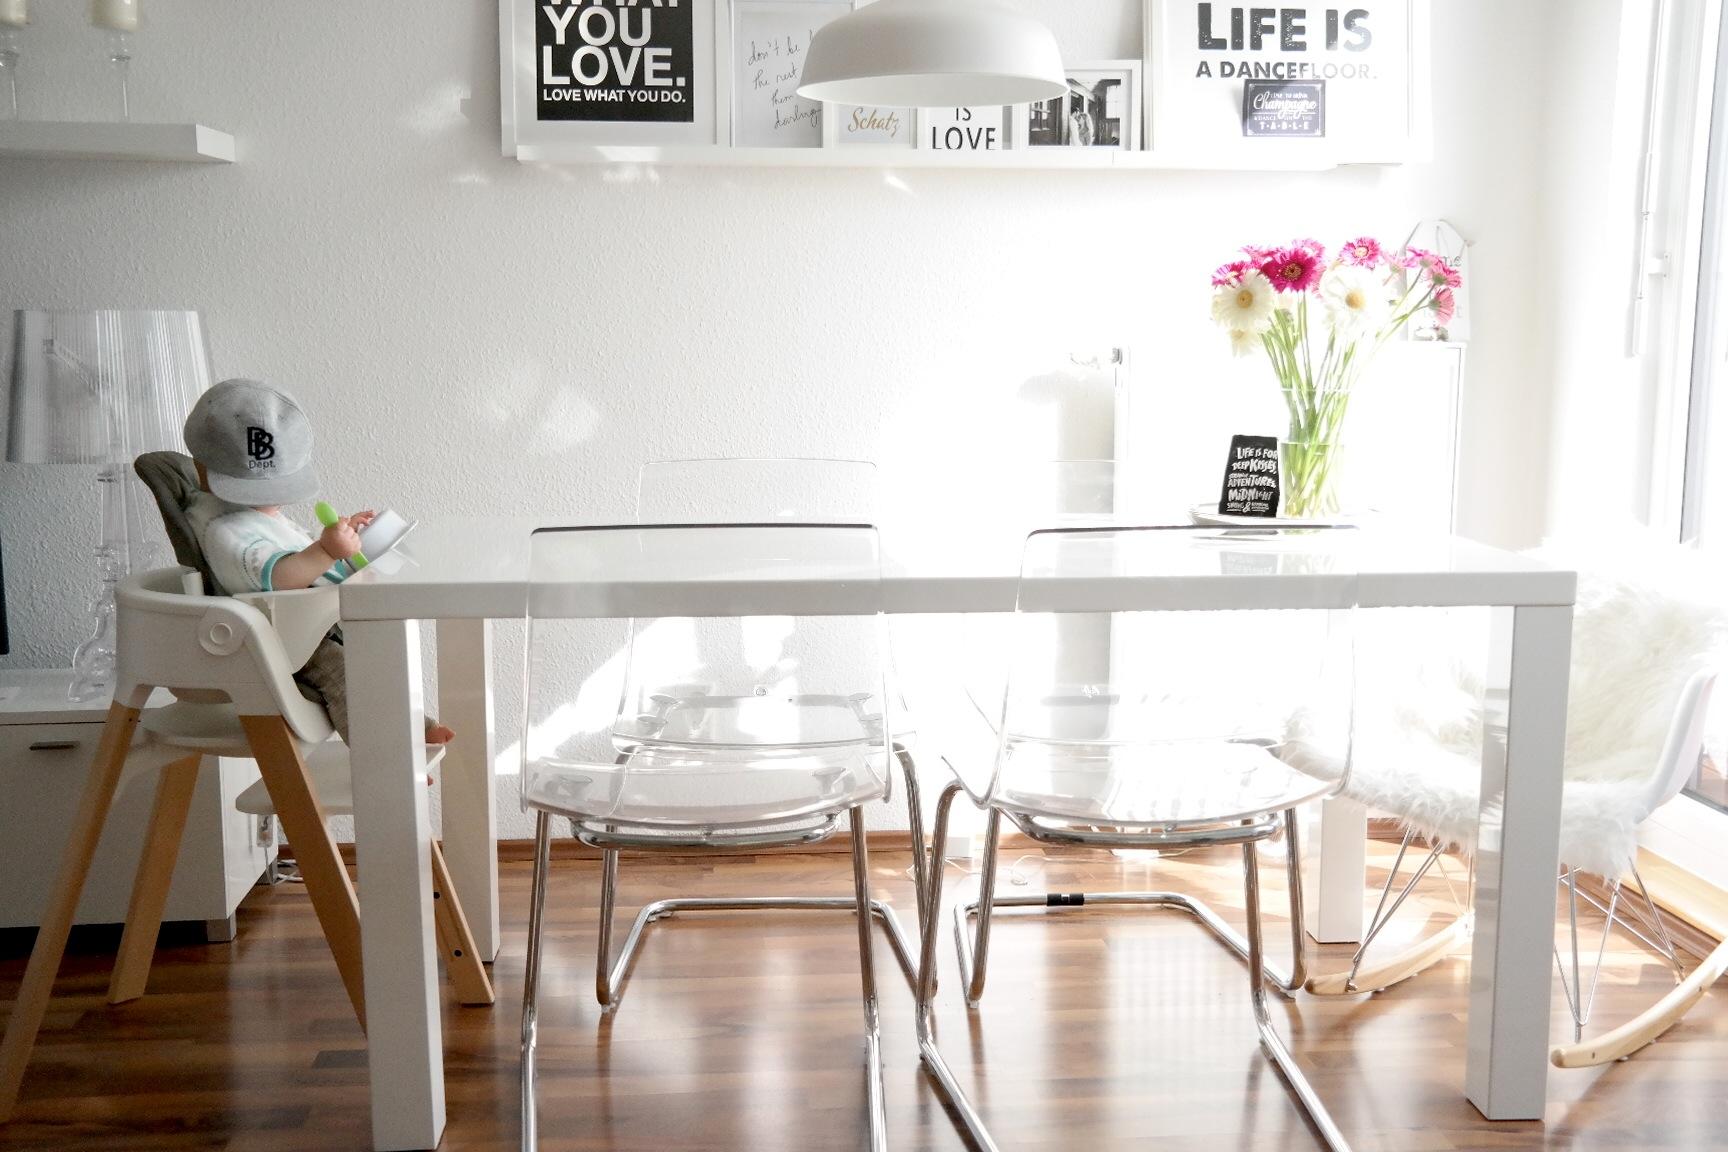 baby als die dritte mahlzeit einzog dazu der stokke steps missbonn e bonn e. Black Bedroom Furniture Sets. Home Design Ideas